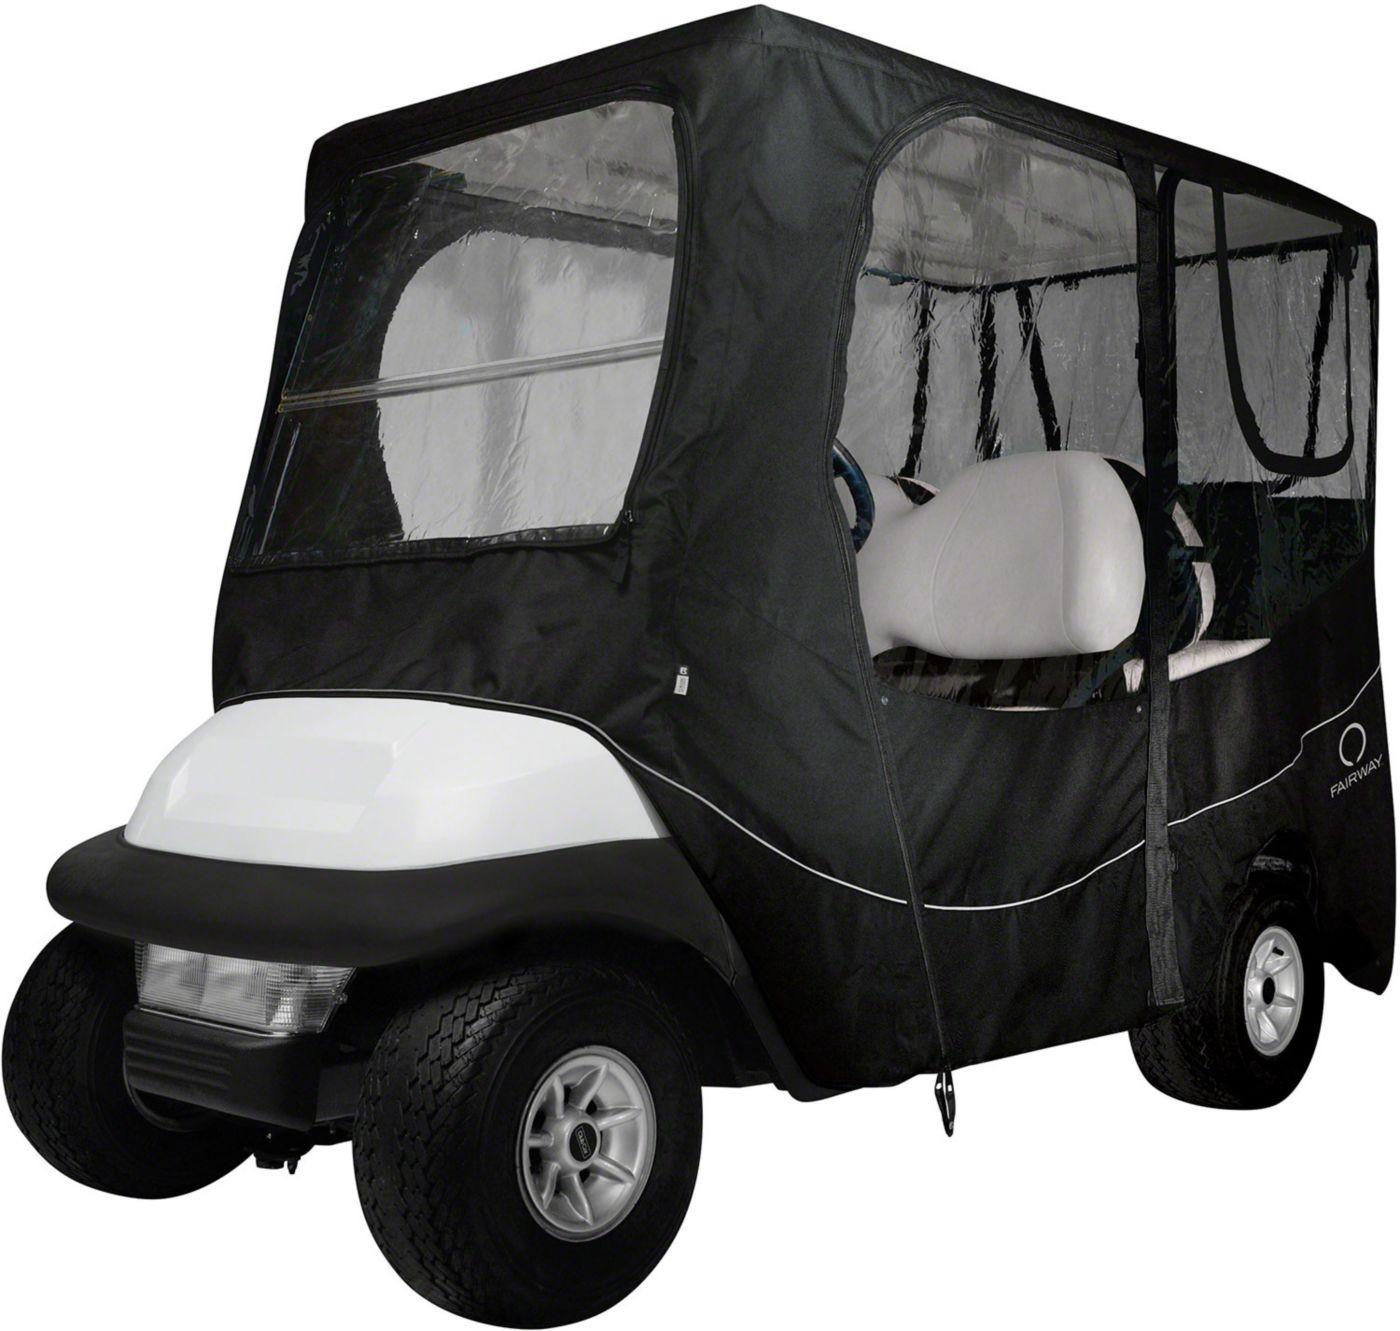 Classic Accessories Fairway Deluxe Long Roof Black Golf Cart Enclosure